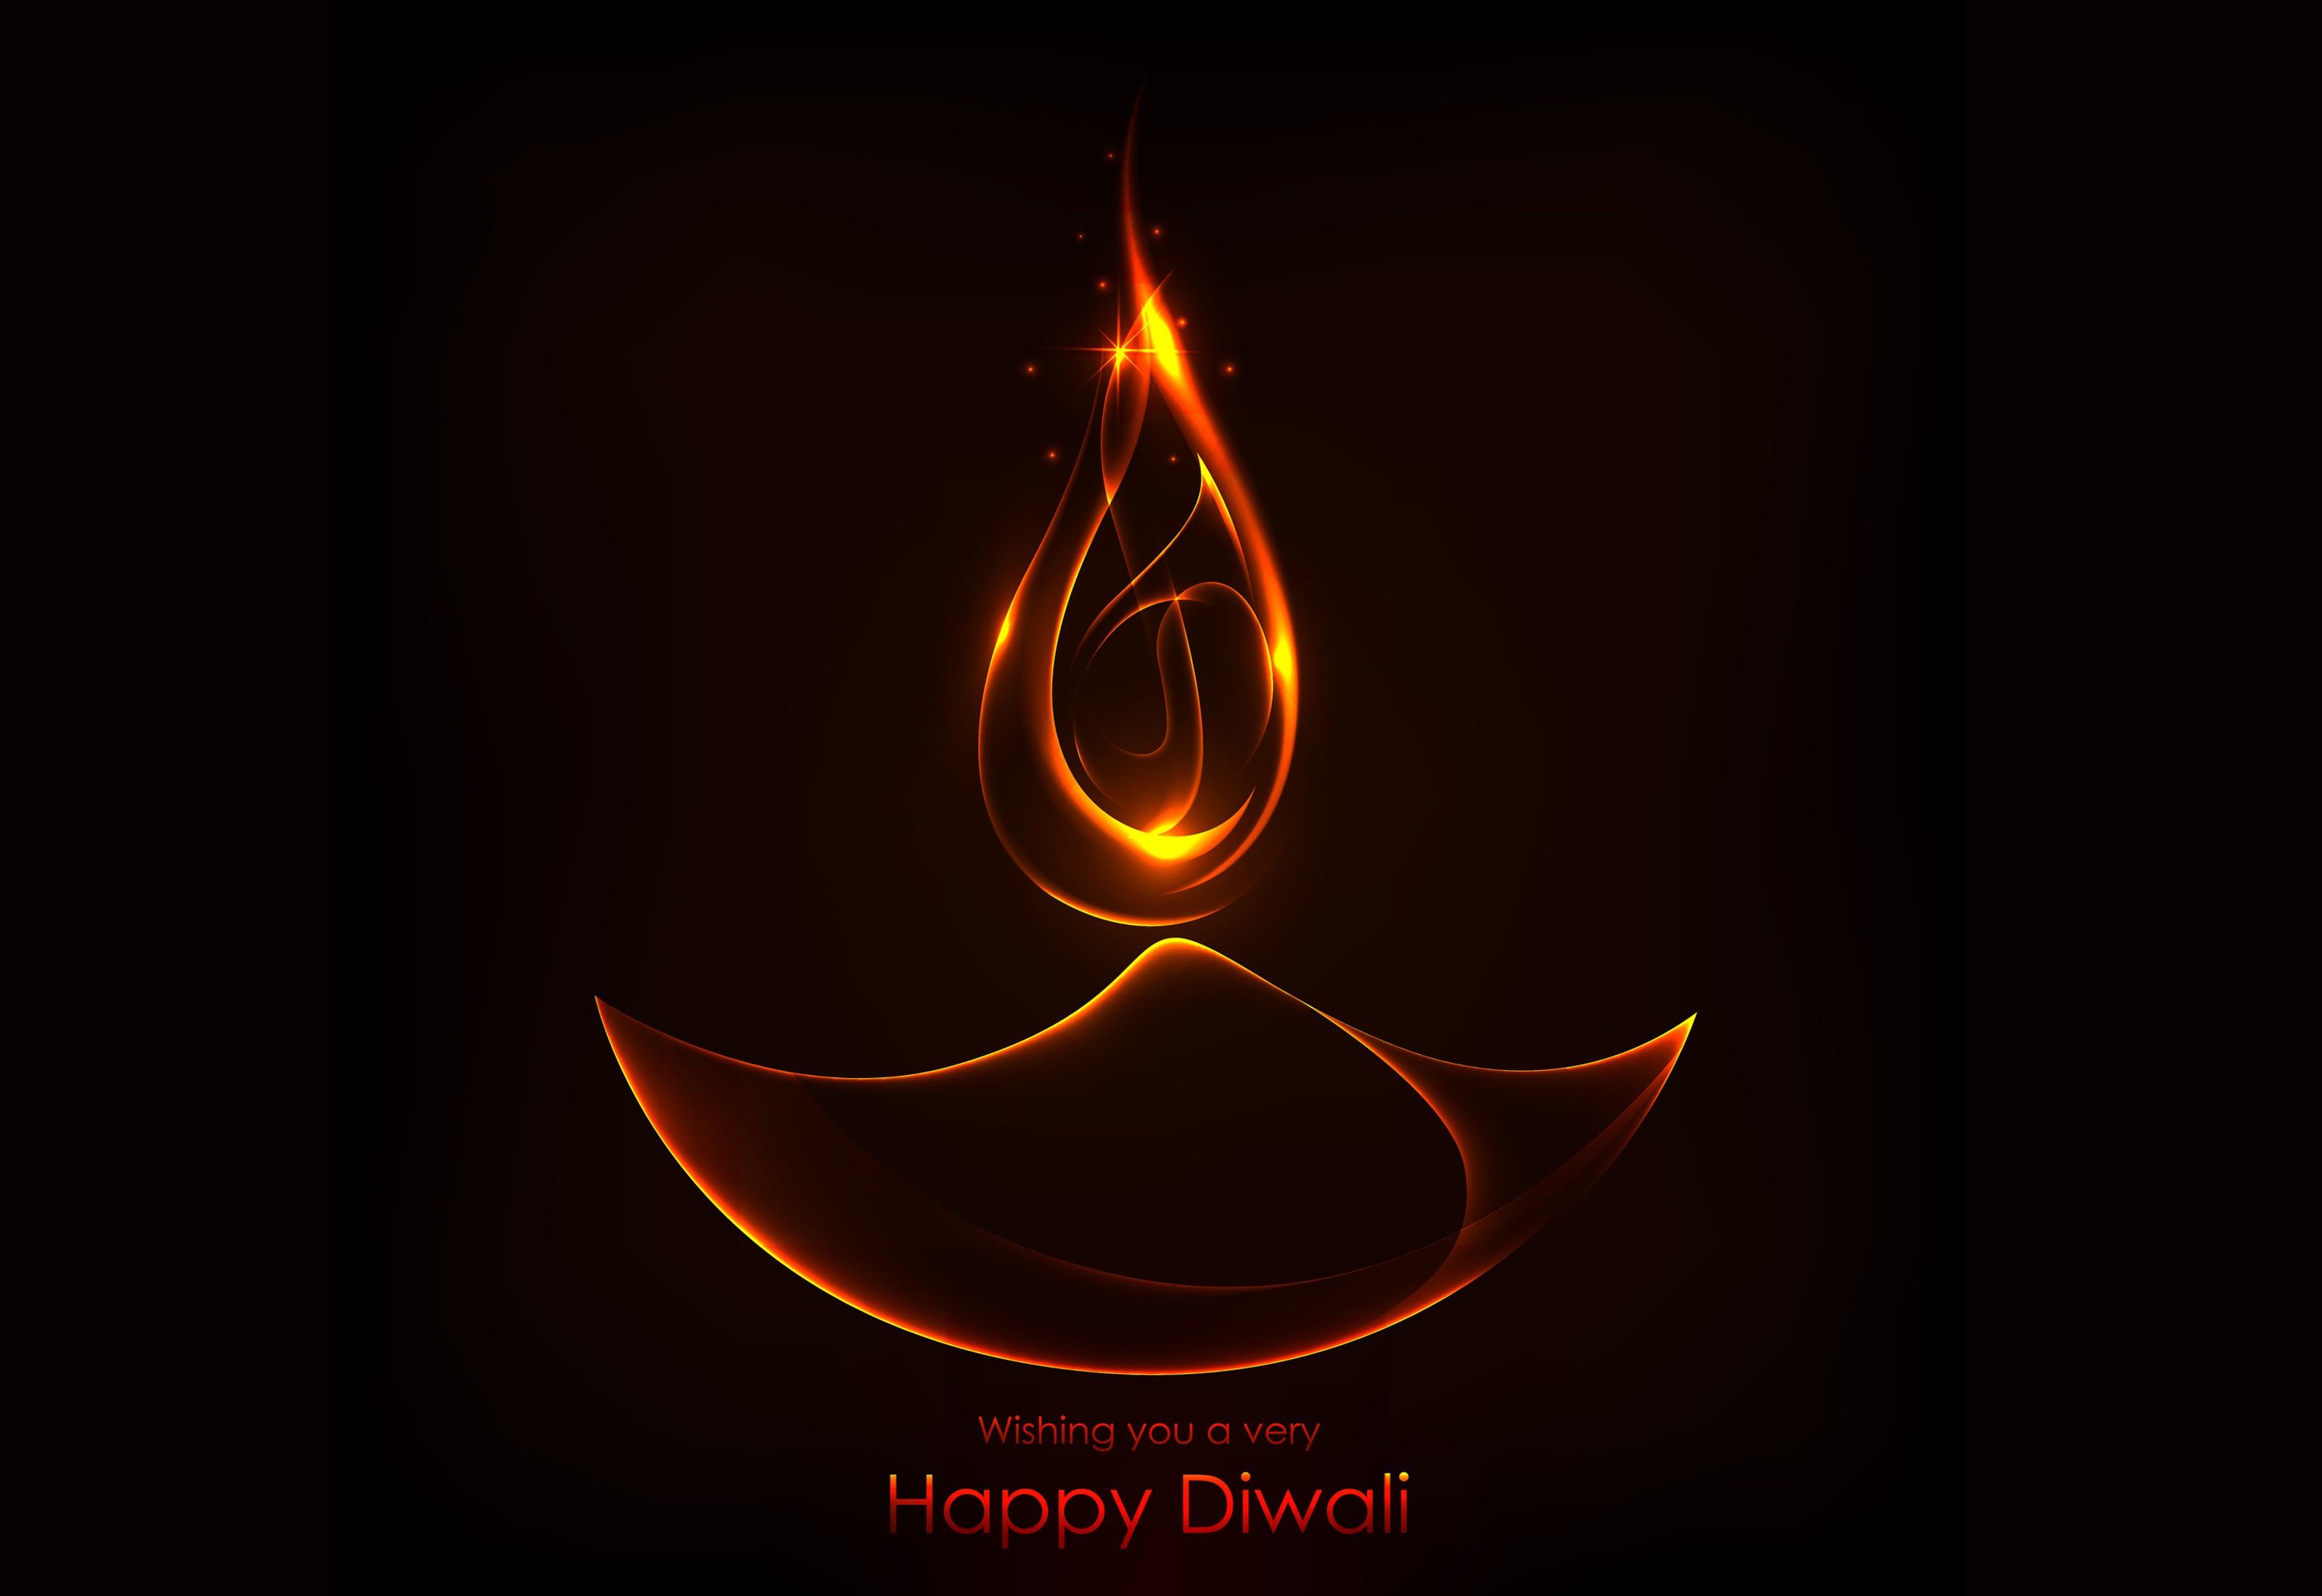 Best Sai Baba 3d Wallpaper 30 Beautiful And Colorful Diwali Greeting Card Designs